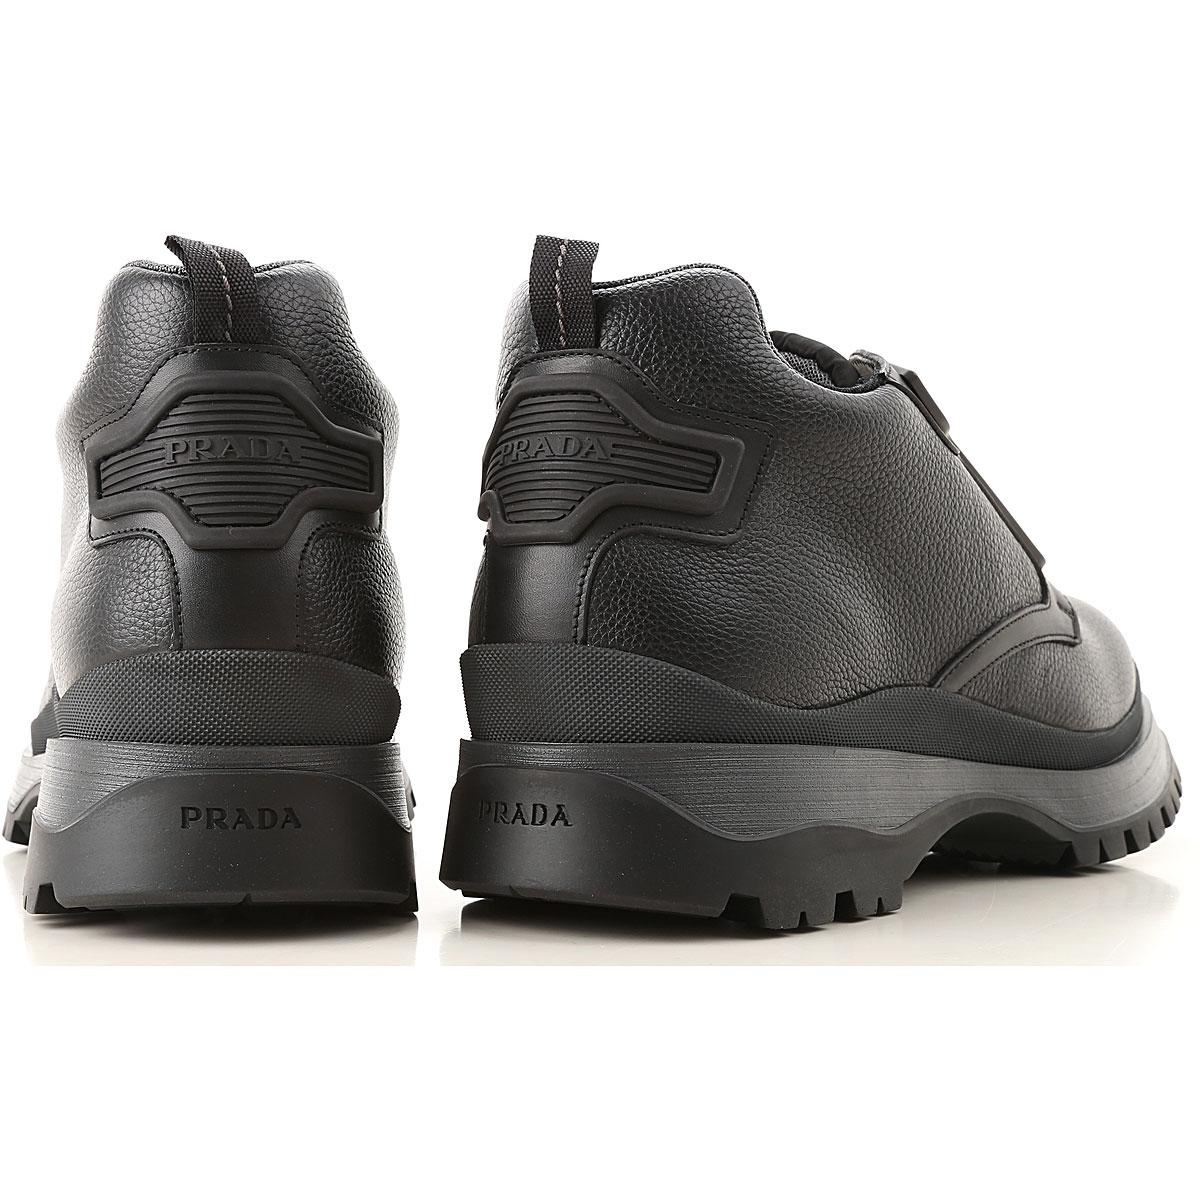 Toile En Adidas Chaussure En Chaussure Adidas Toile KJ3TFlc1